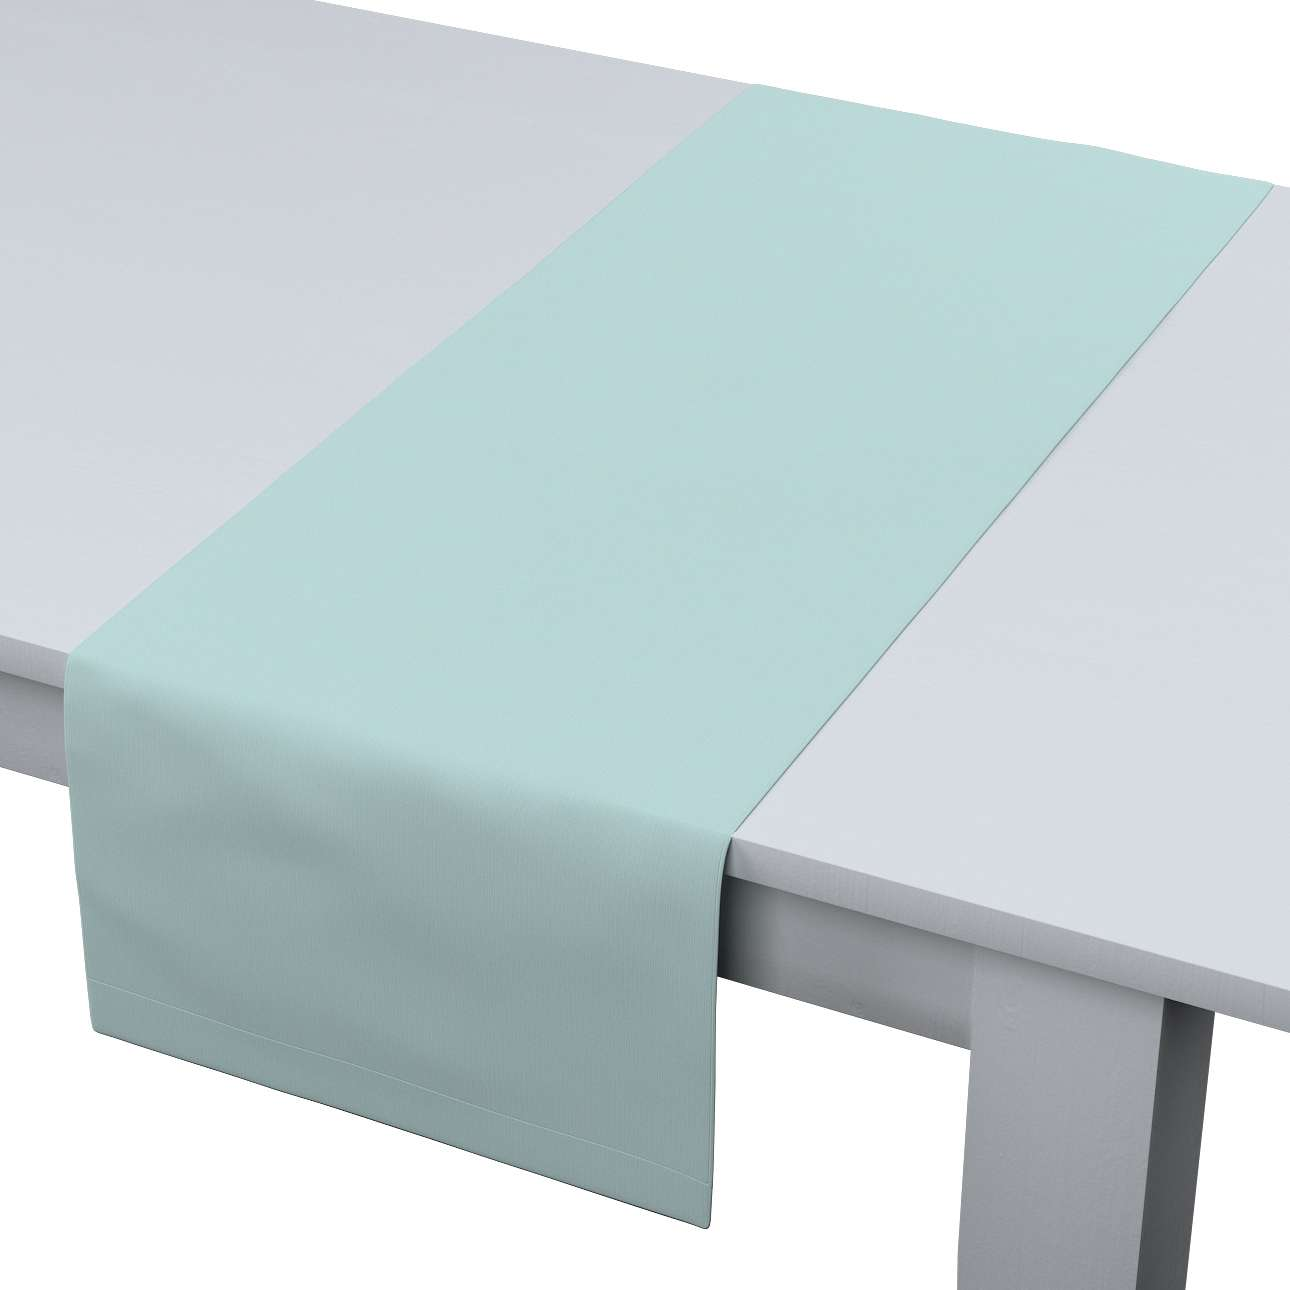 Štóla na stôl V kolekcii Cotton Panama, tkanina: 702-10